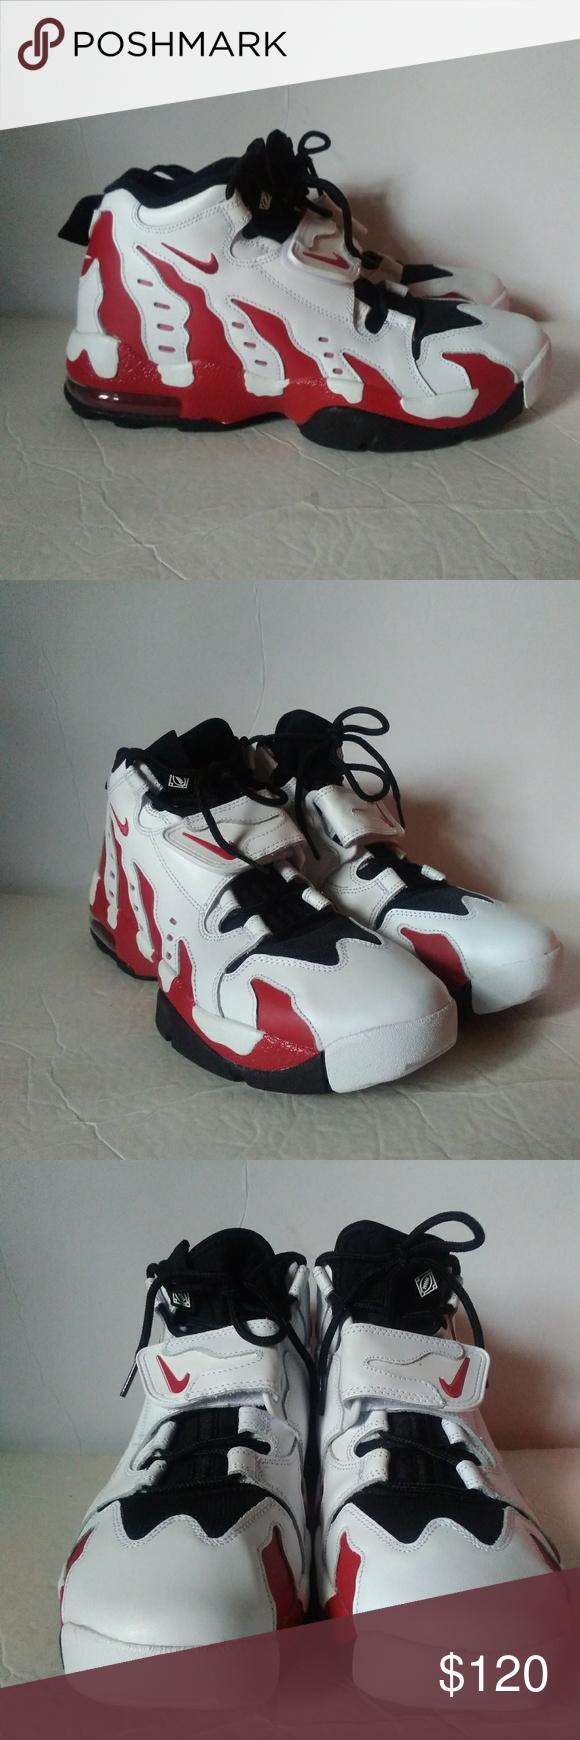 aa6f0b96f7 Nike Air DT Max 96 Deion Sanders Men Size 9.5 New Never Worn Nike Air DT